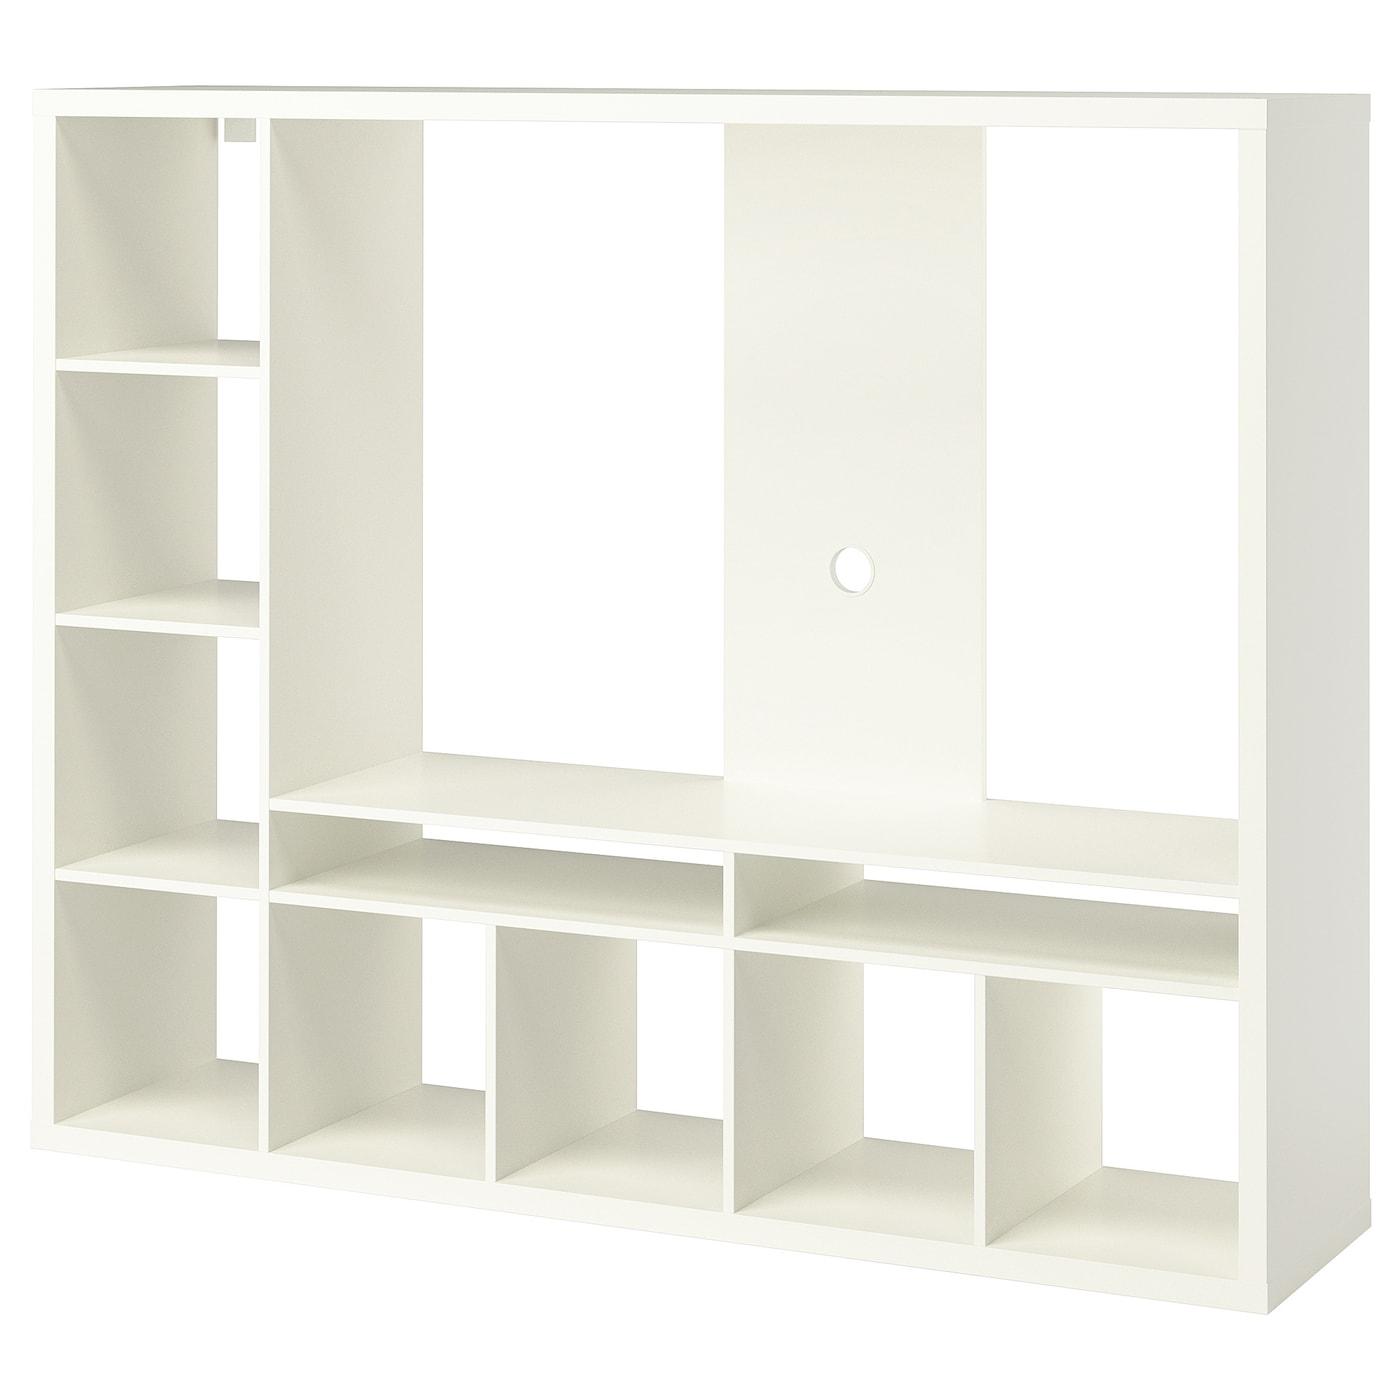 Lappland mueble para tv blanco 183 x 39 x 147 cm ikea - Mueble blanco ikea ...